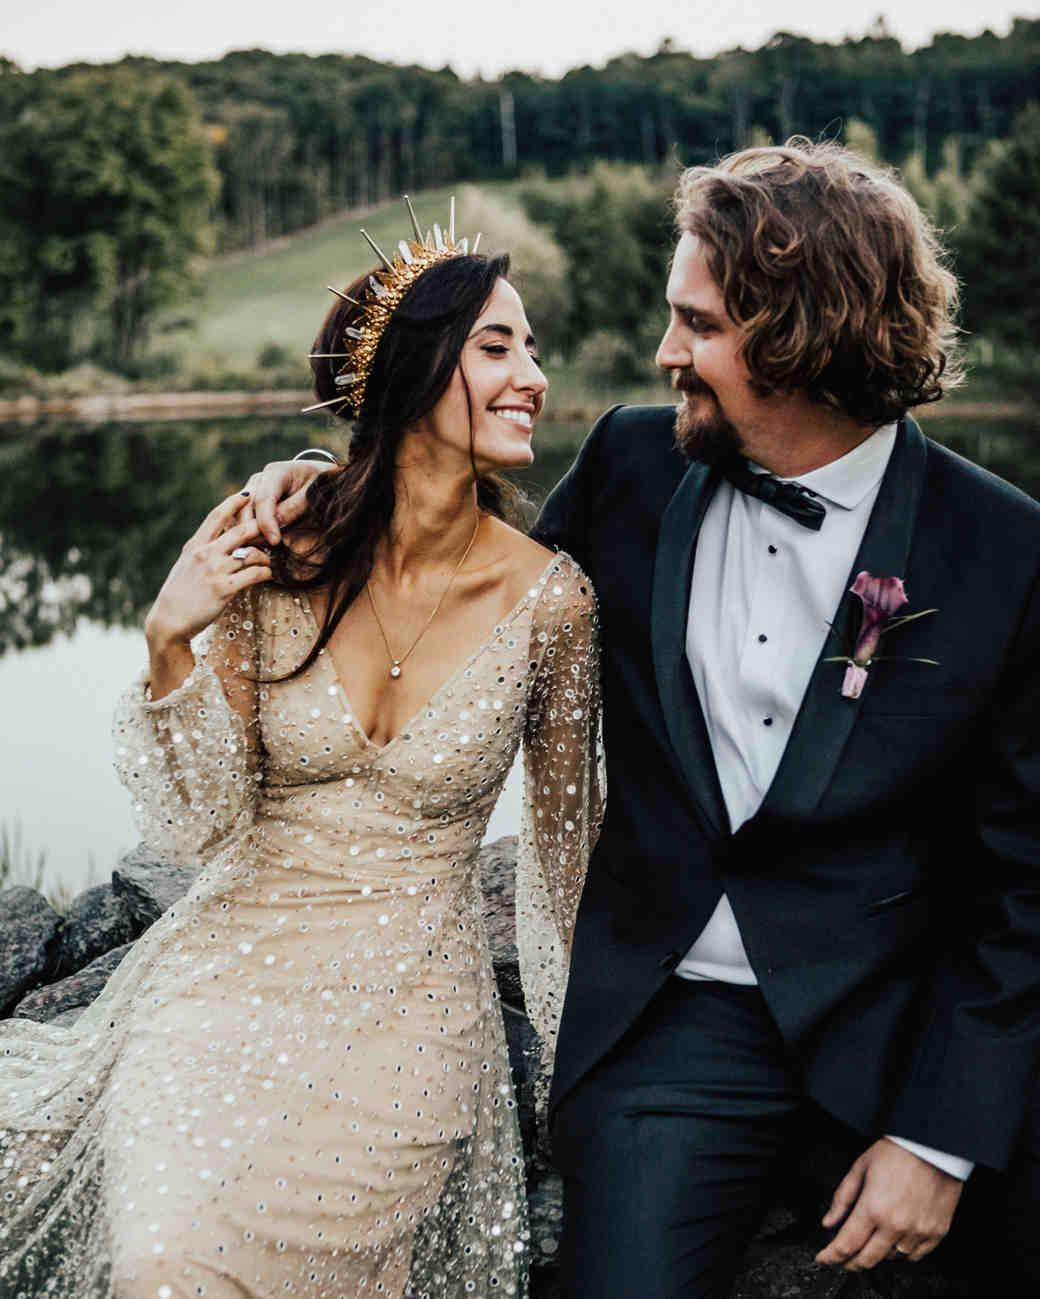 bride smiles at groom next to lake shore